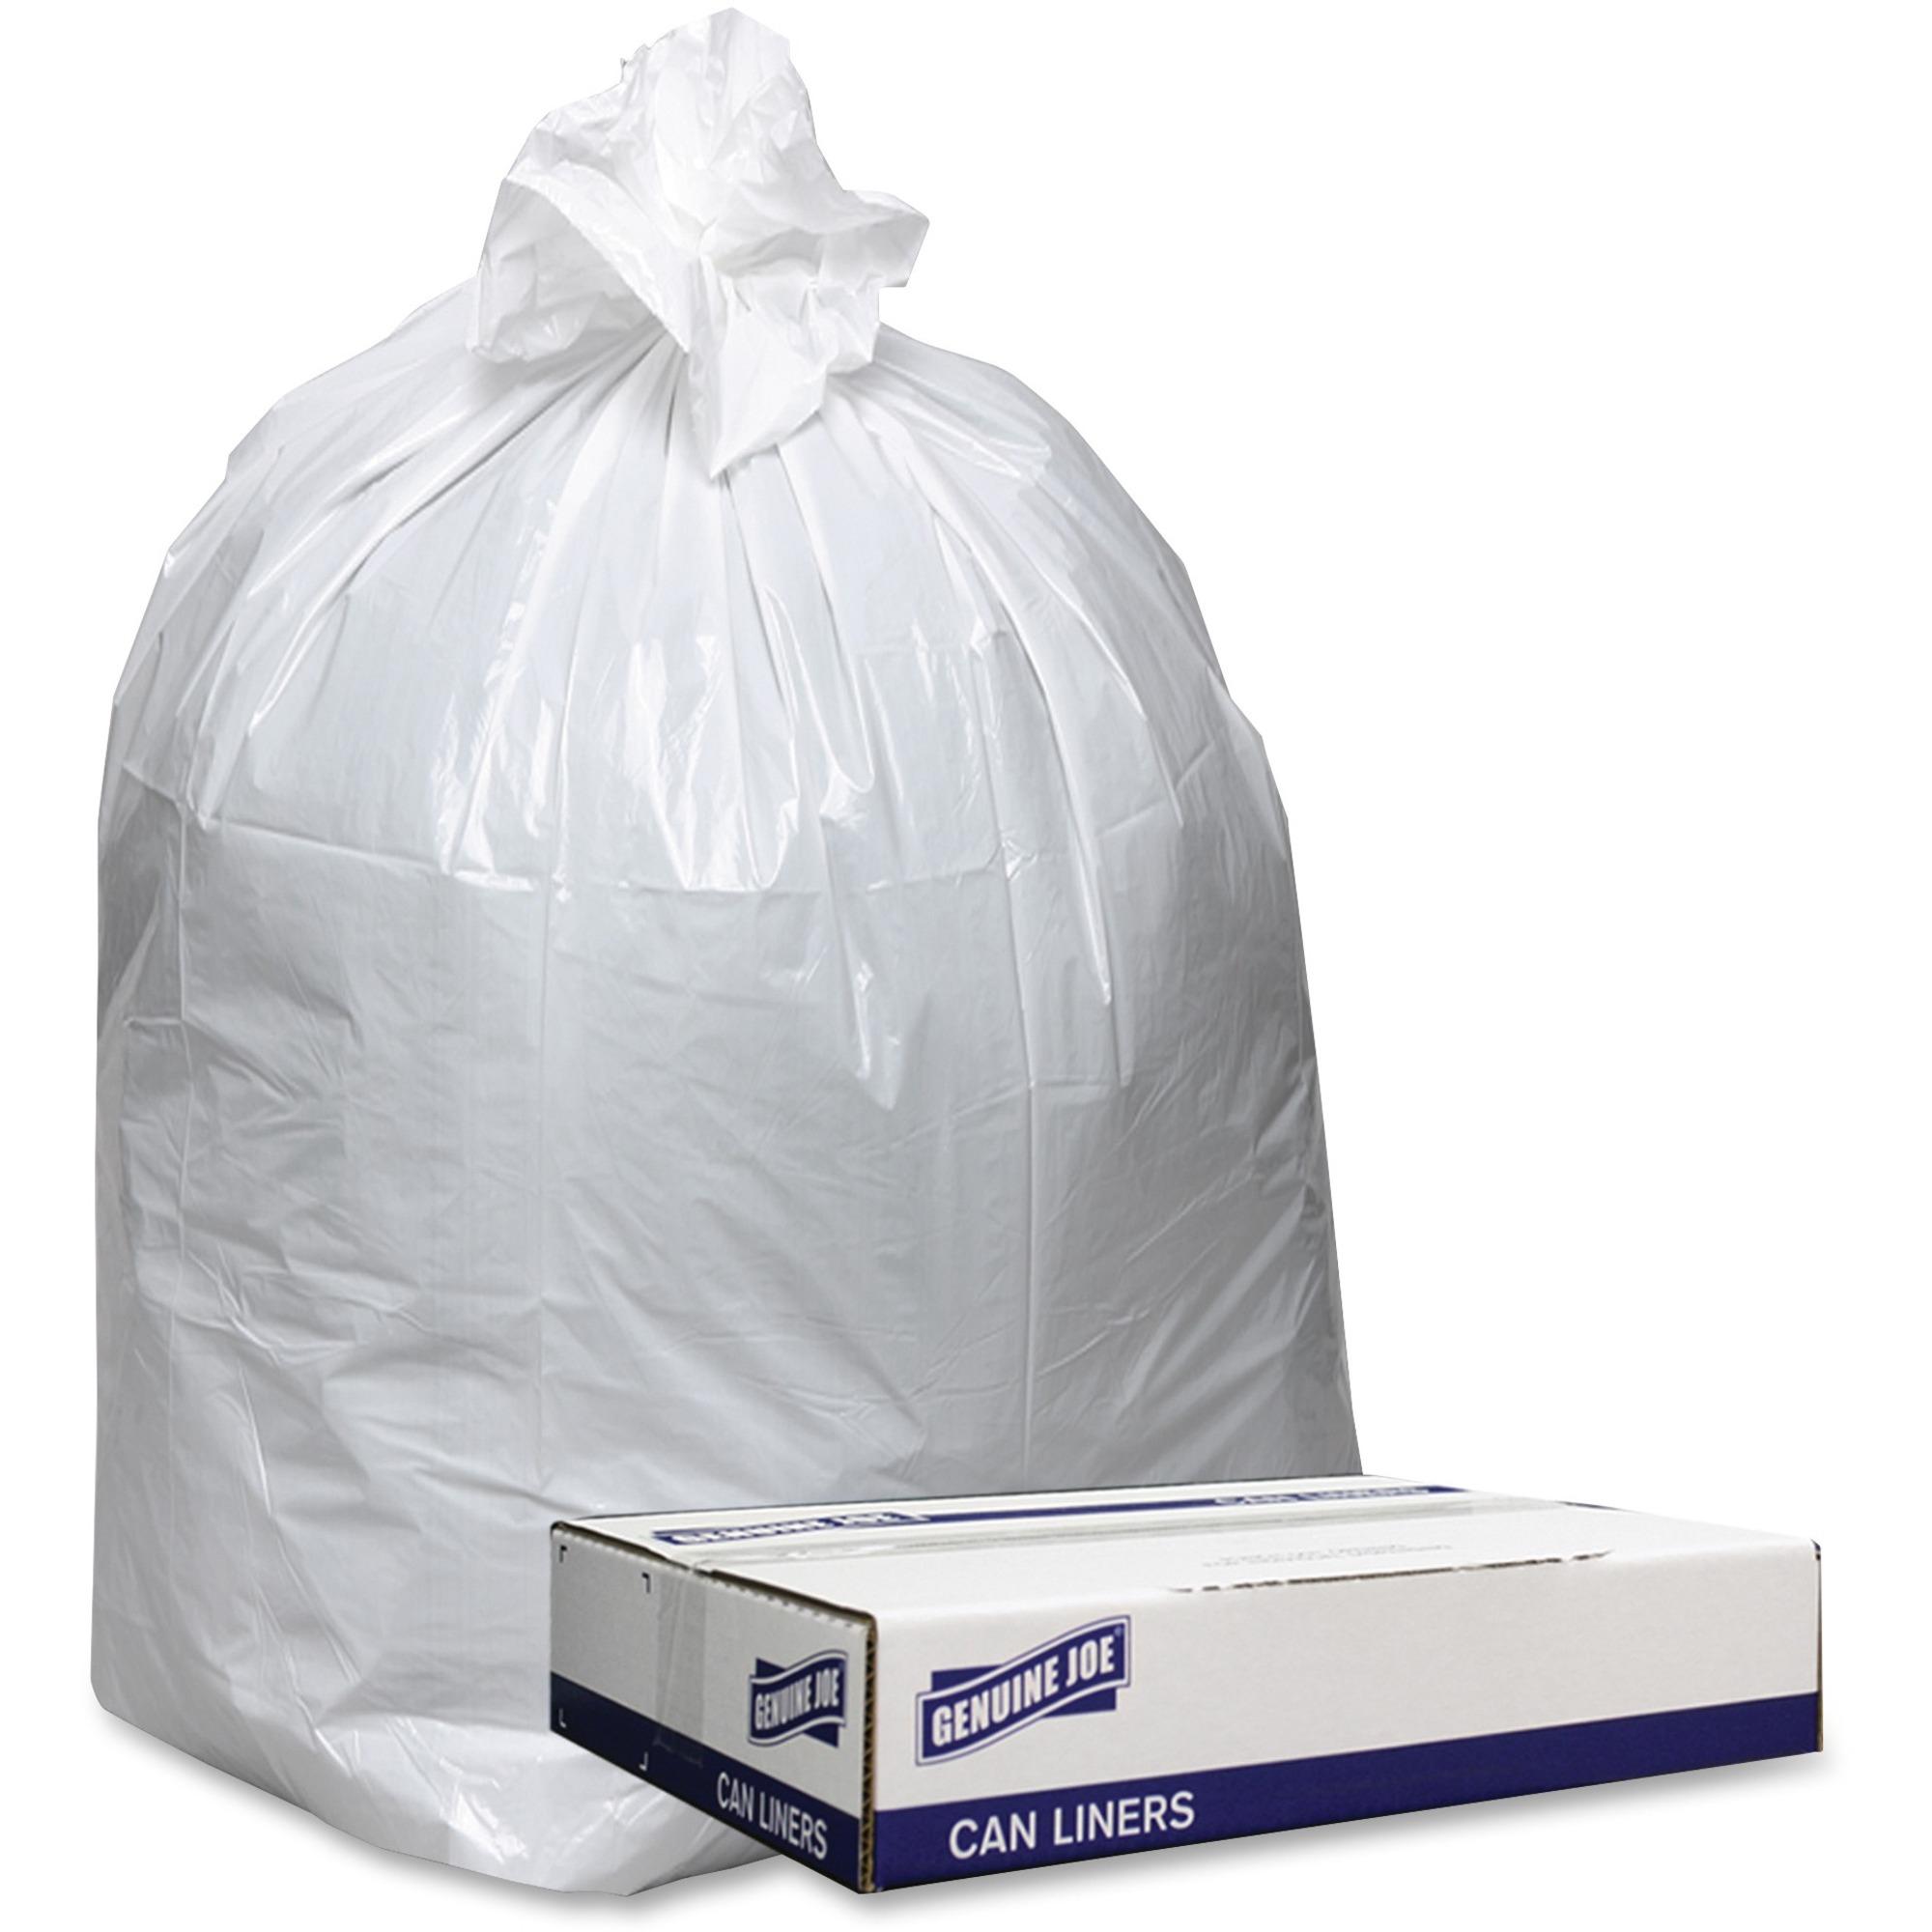 white trash can. Genuine Joe Extra Heavy-duty White Trash Can Liners - 38\ W